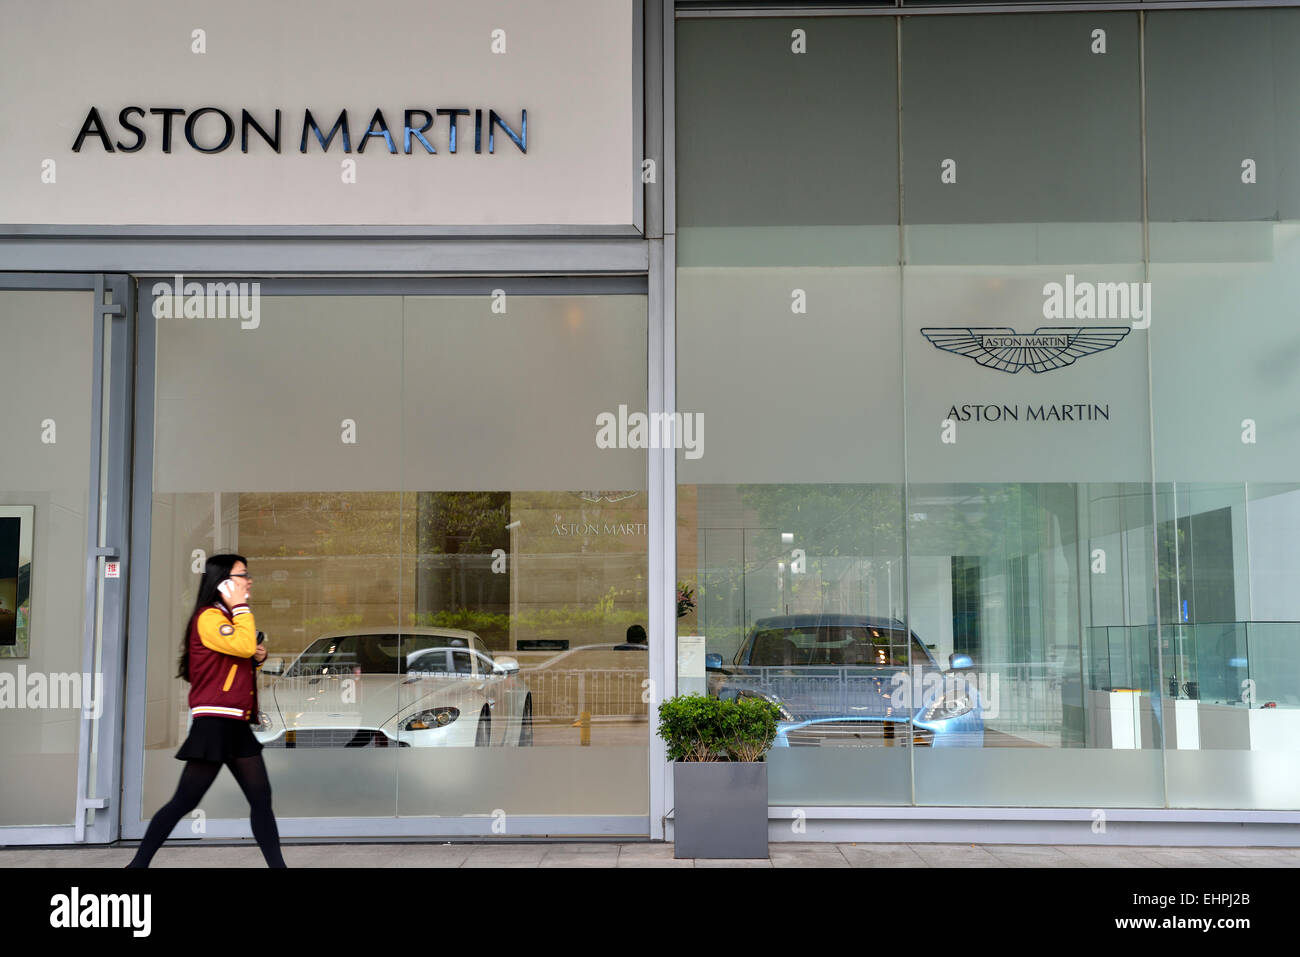 Aston Martin store in Shenzhen, China. - Stock Image